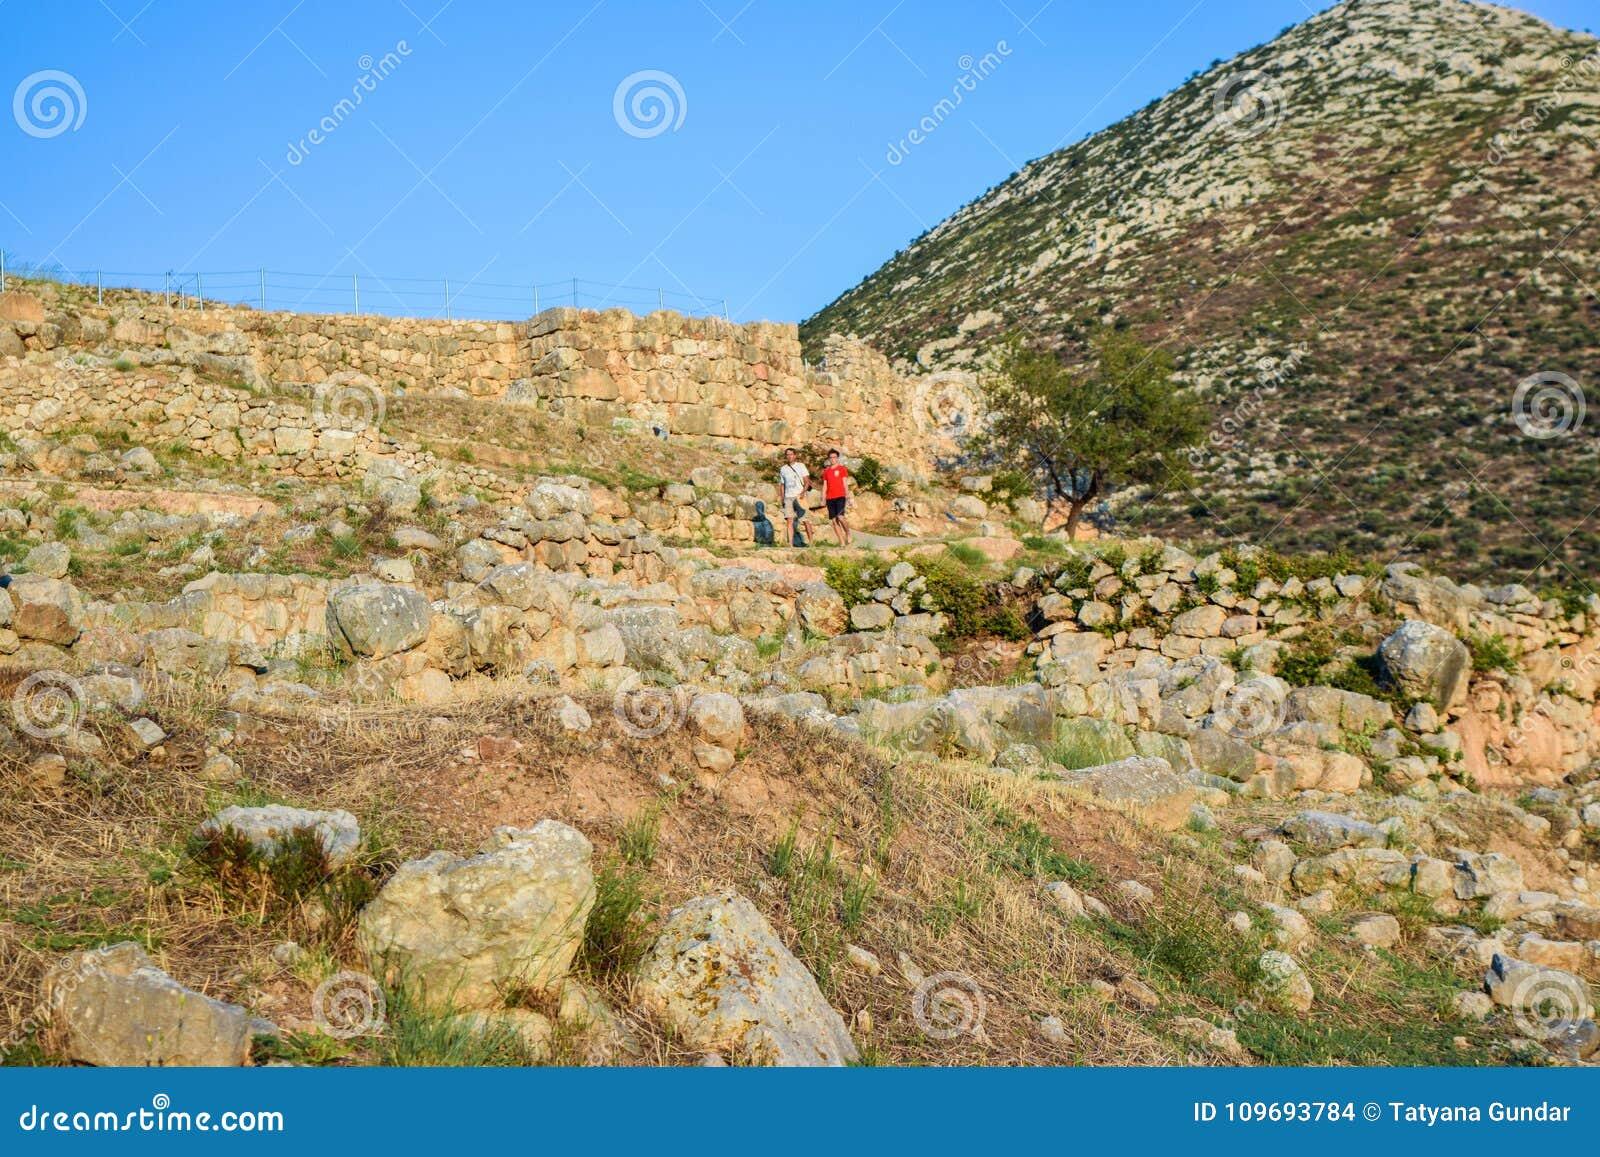 Ruins of Mycenae Citadel, Greece.